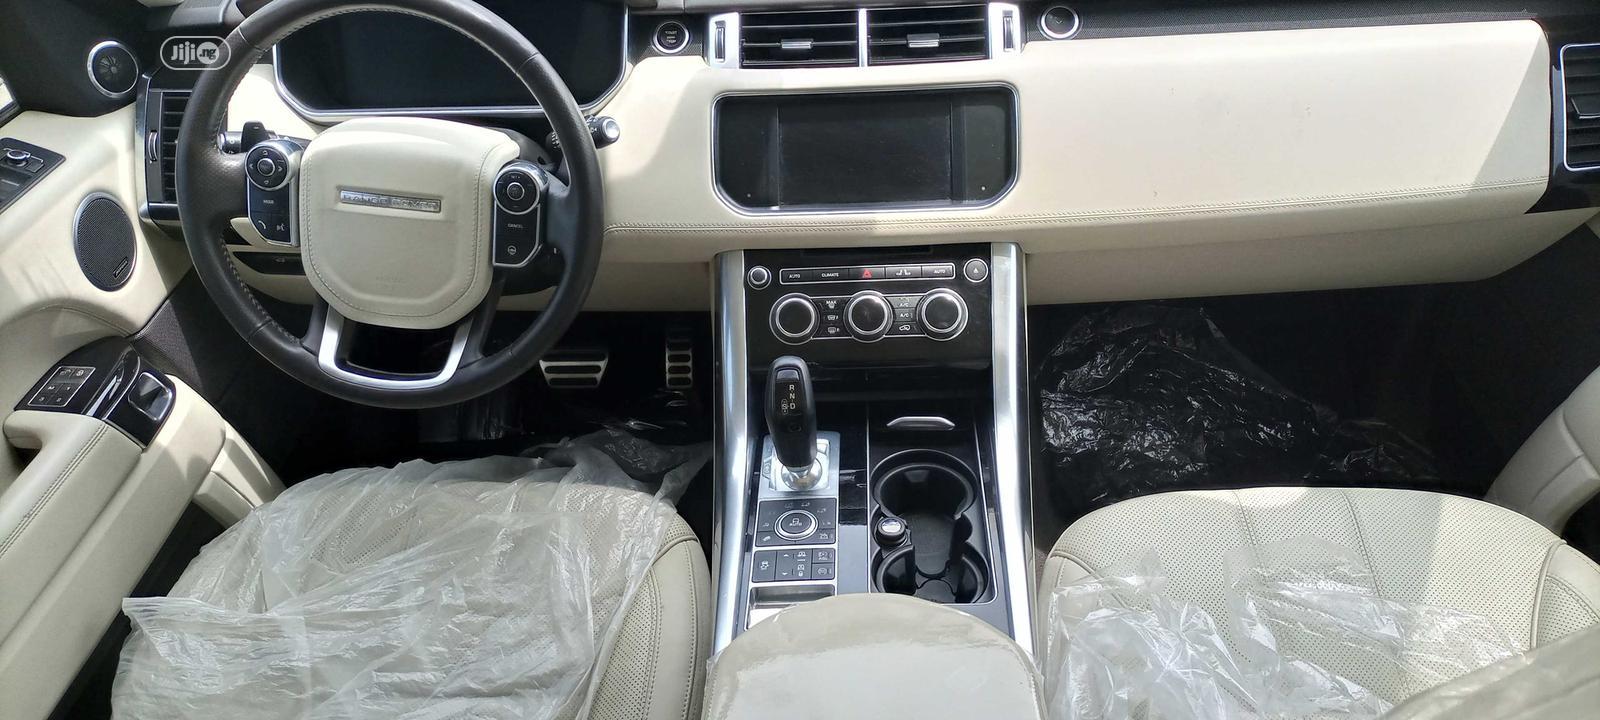 Archive: Land Rover Range Rover Sport 2013 White